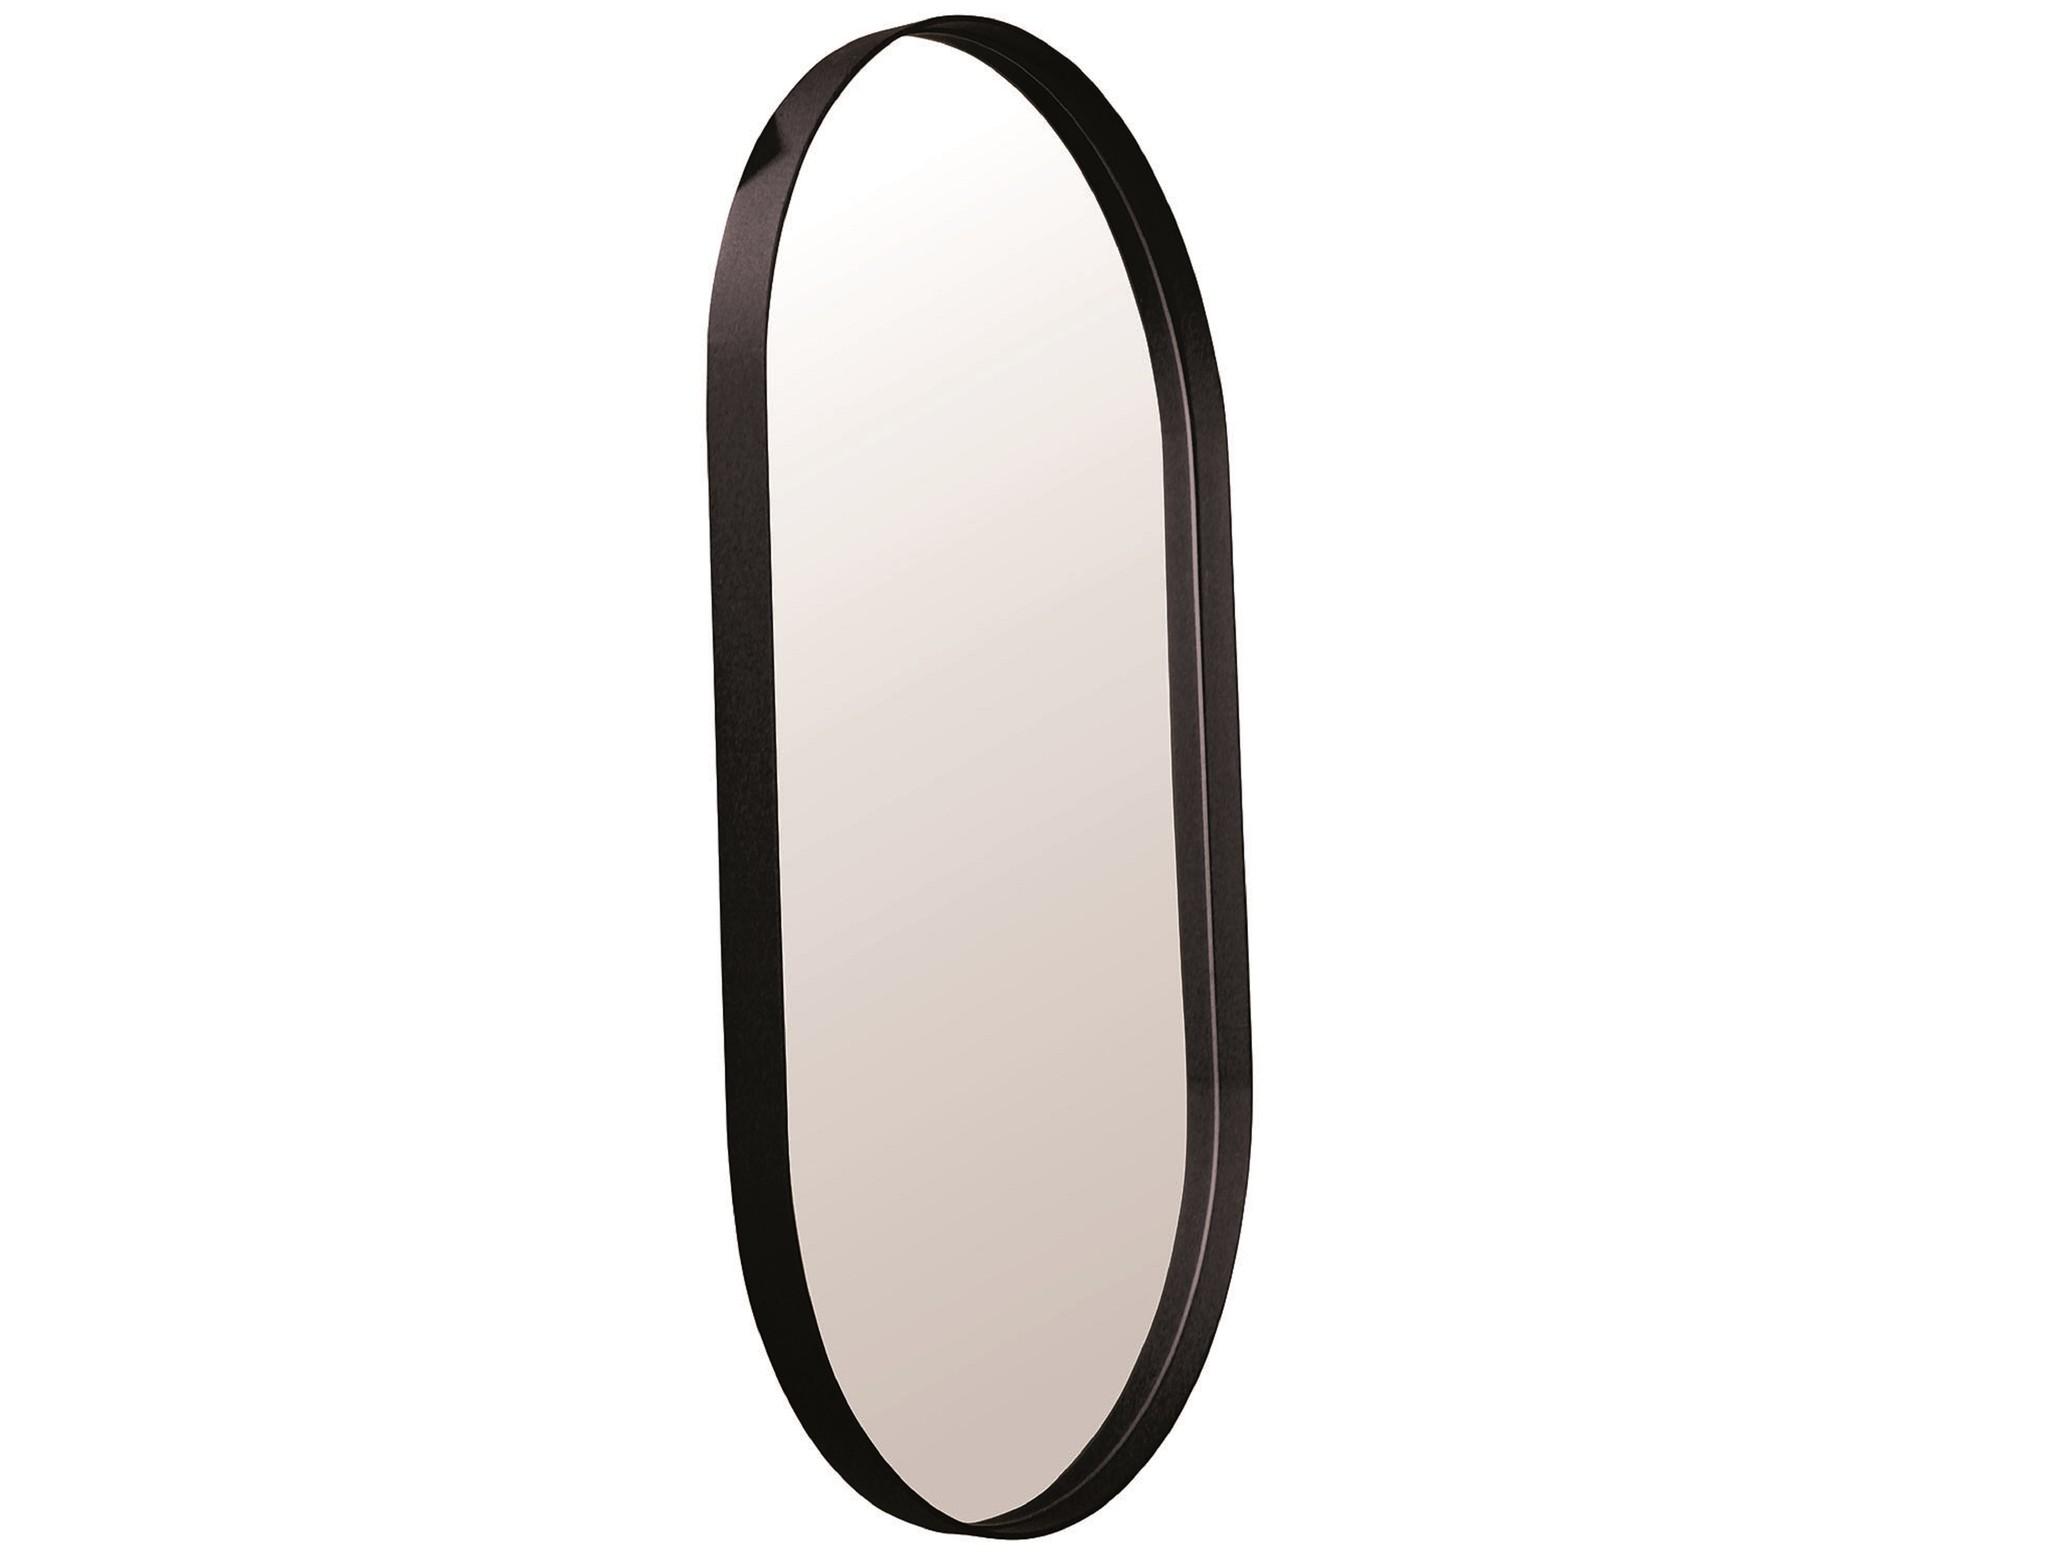 Настенное зеркало ванда 120*40 (simple mirror) черный 40.0x120.0x4.0 см.